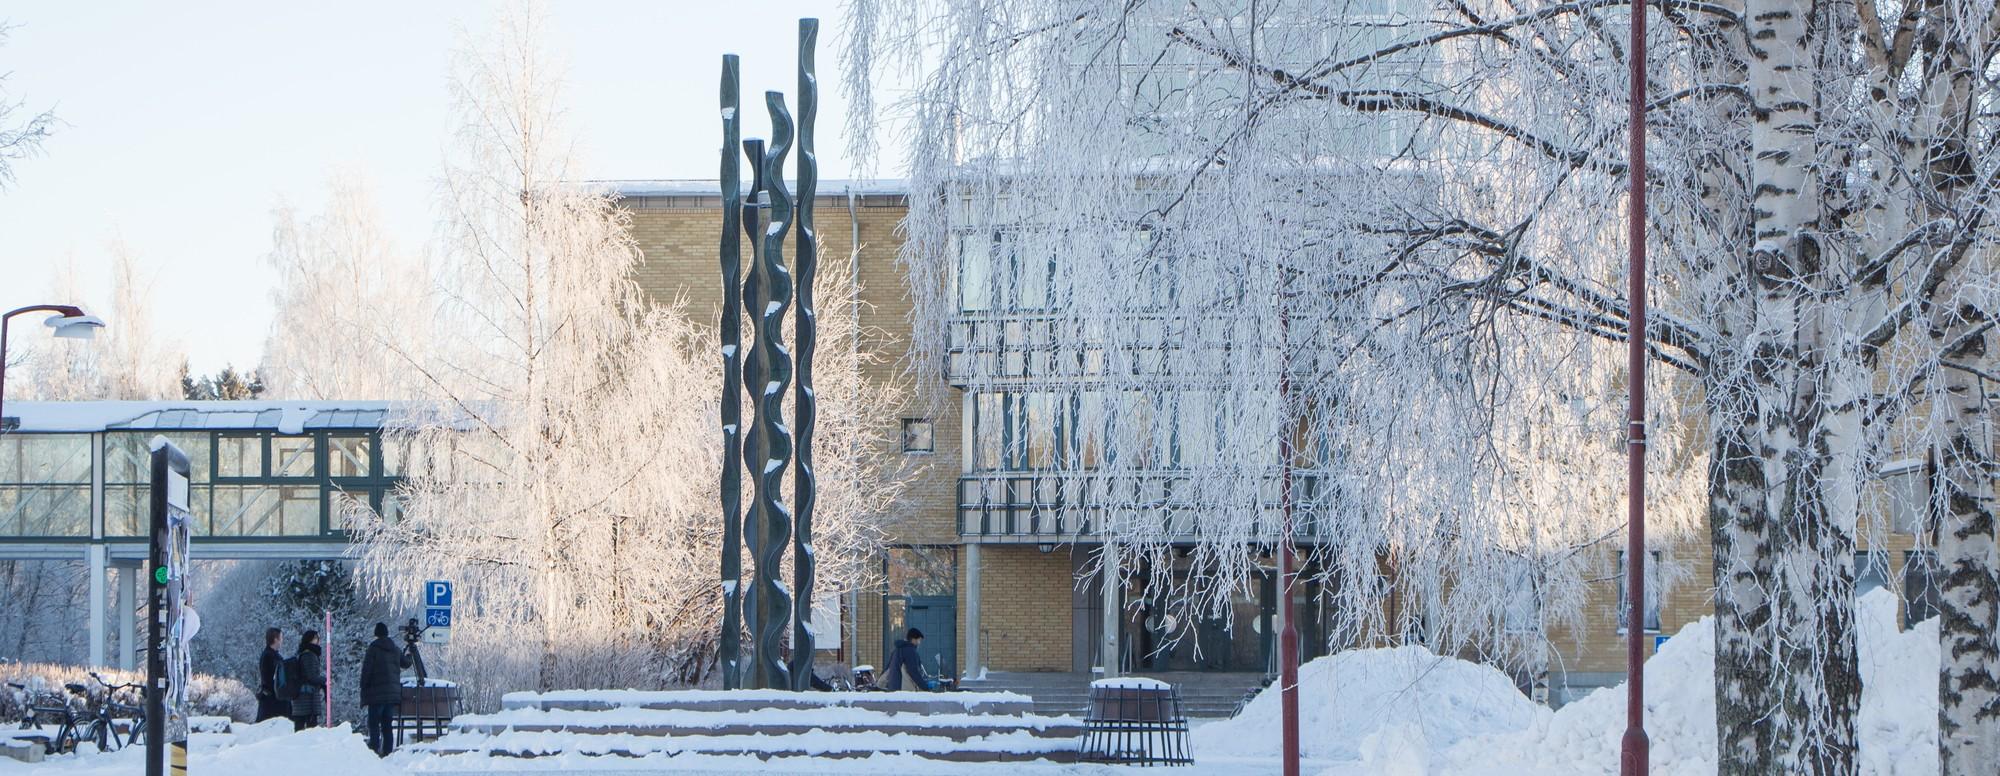 campus_vinter_IMG_1039_160125_UBK anpassad.jpg